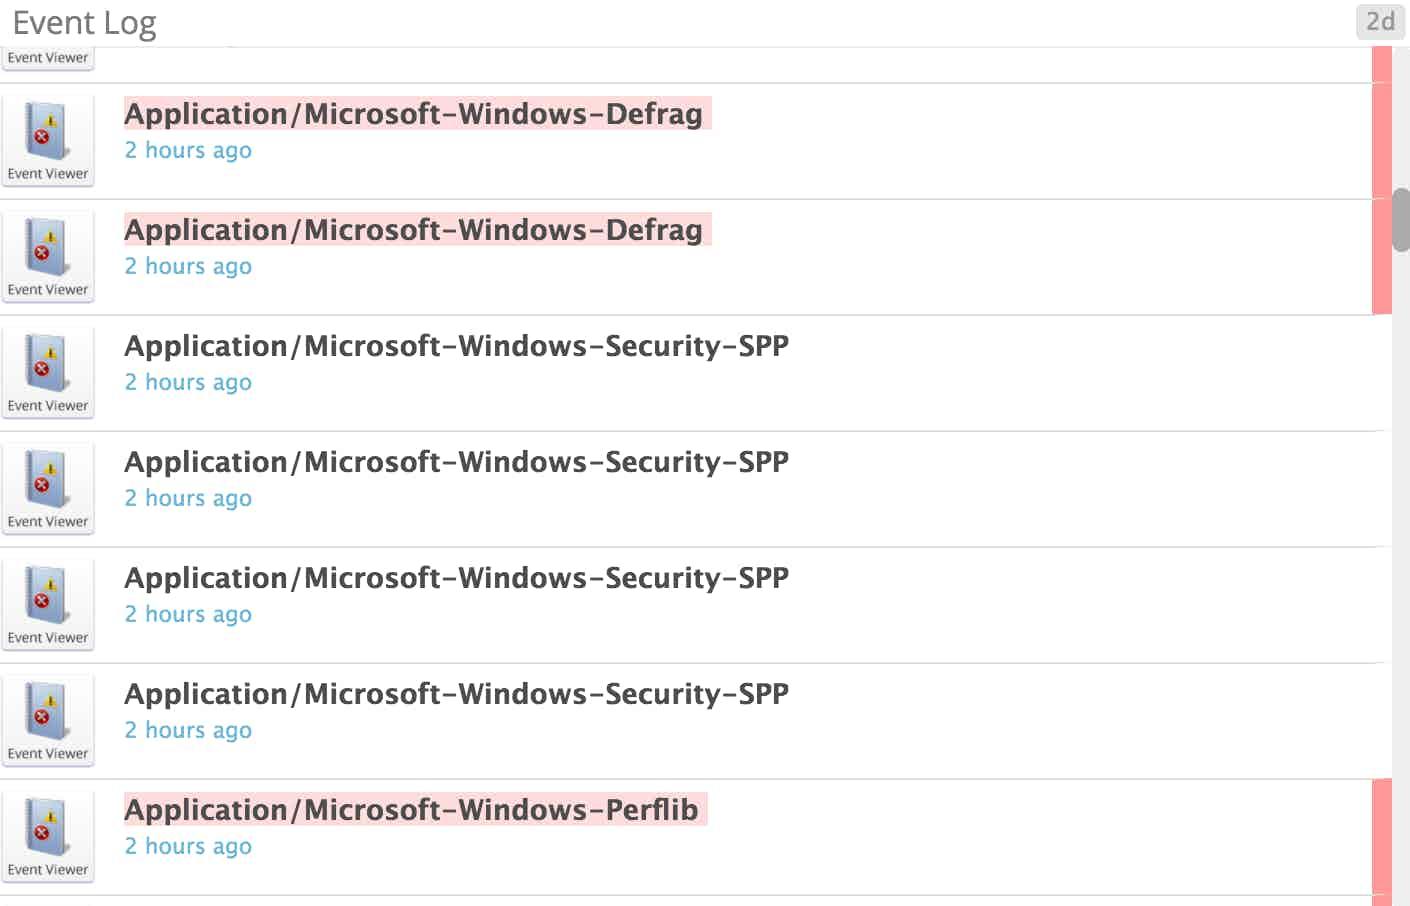 Windows Server 2012 monitoring - Event log snip